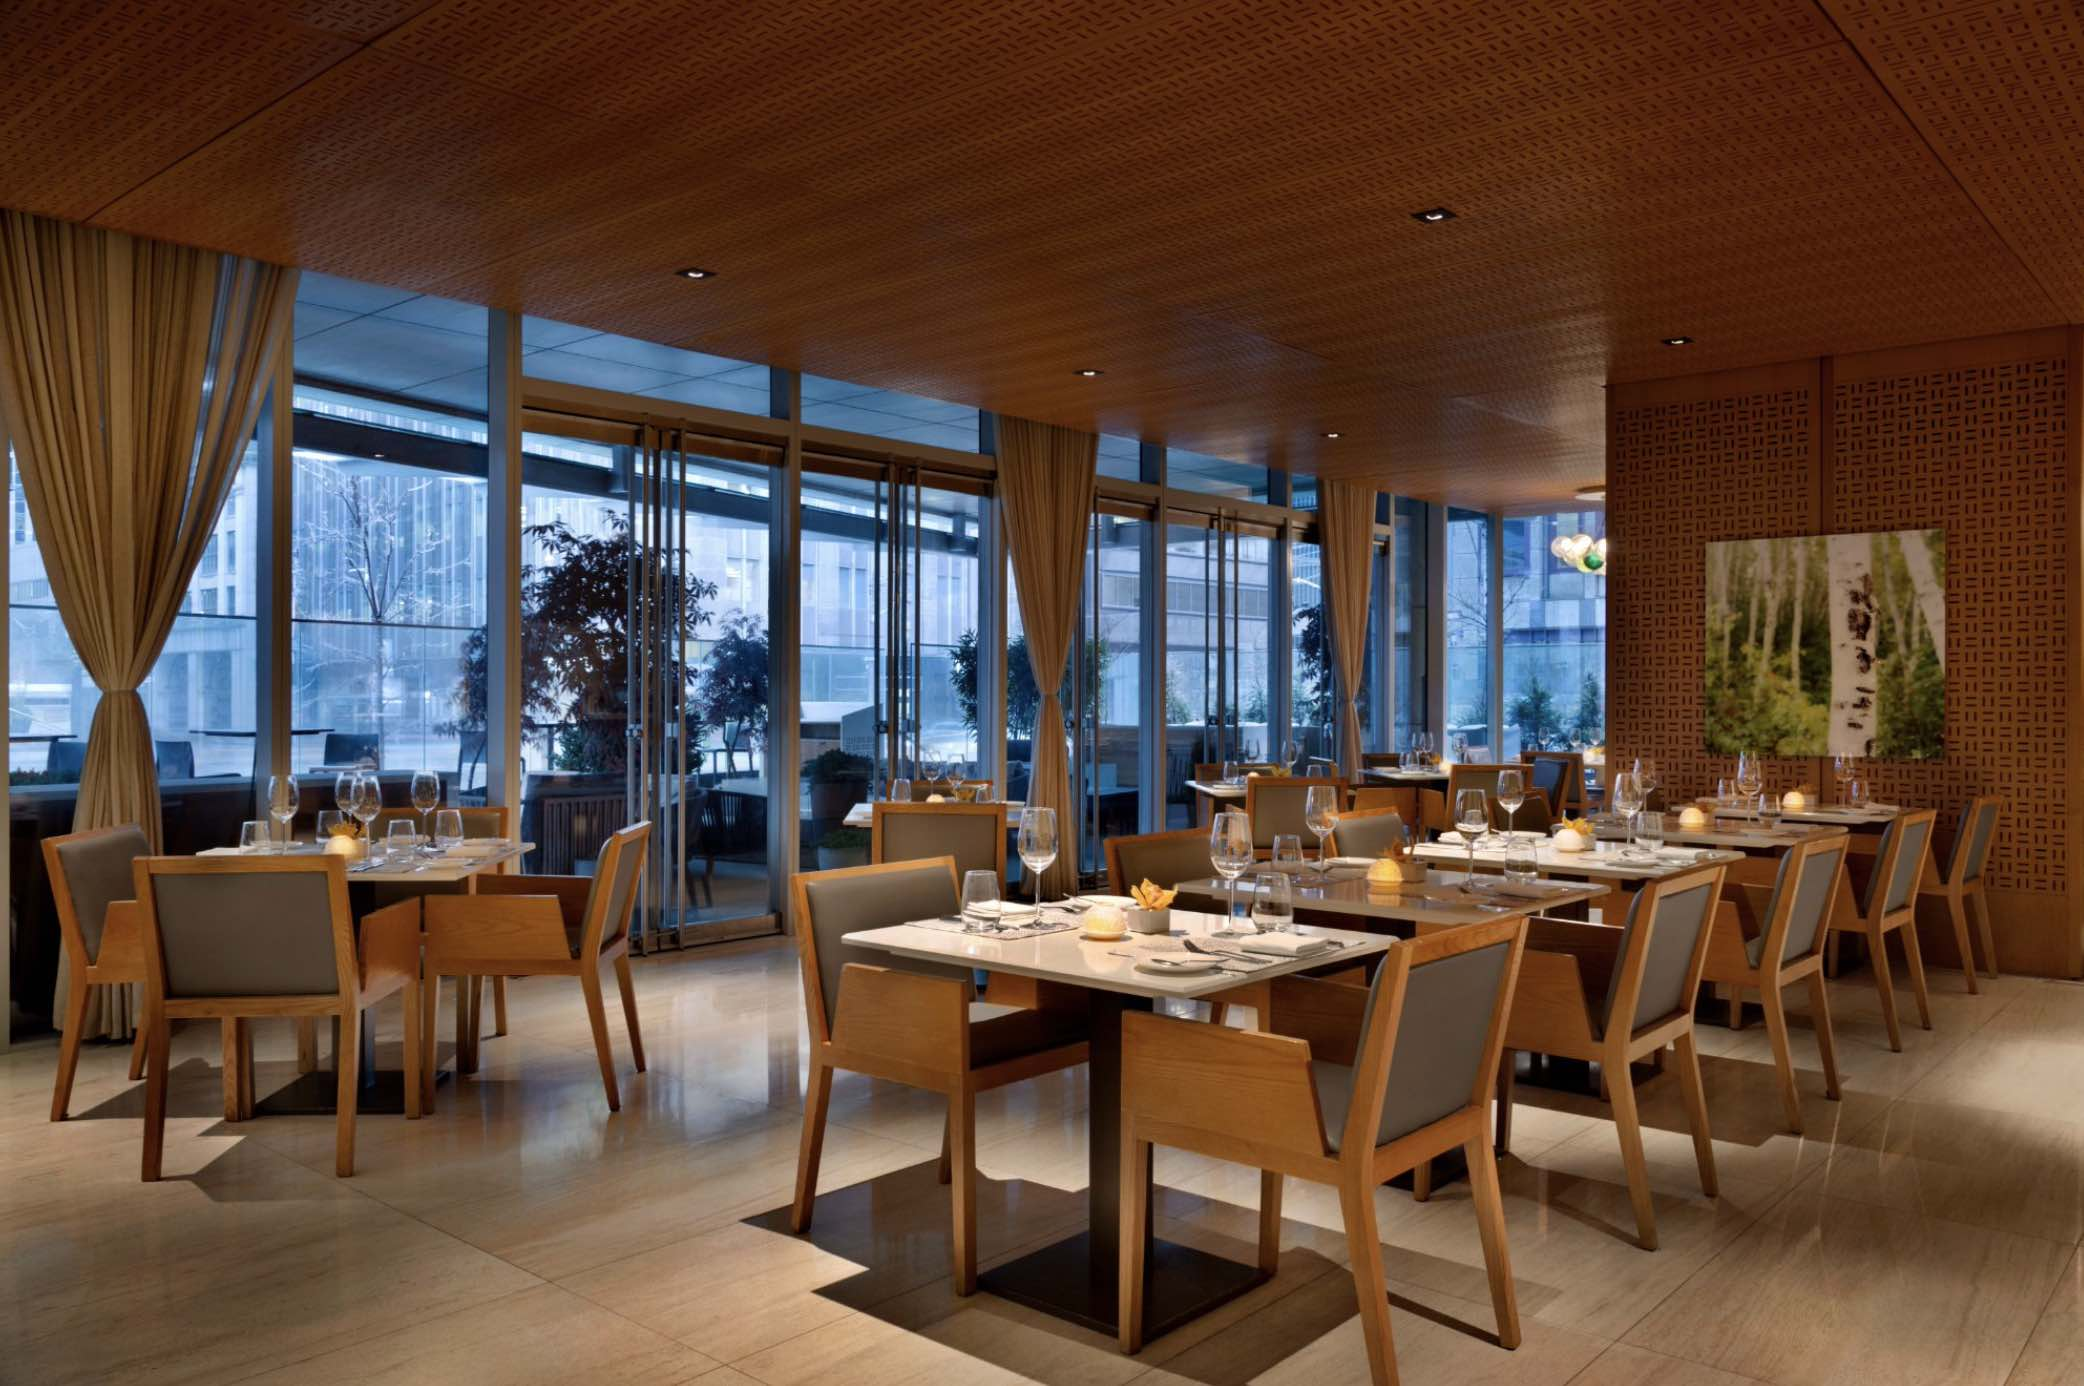 Bosk Restaurant interior shot